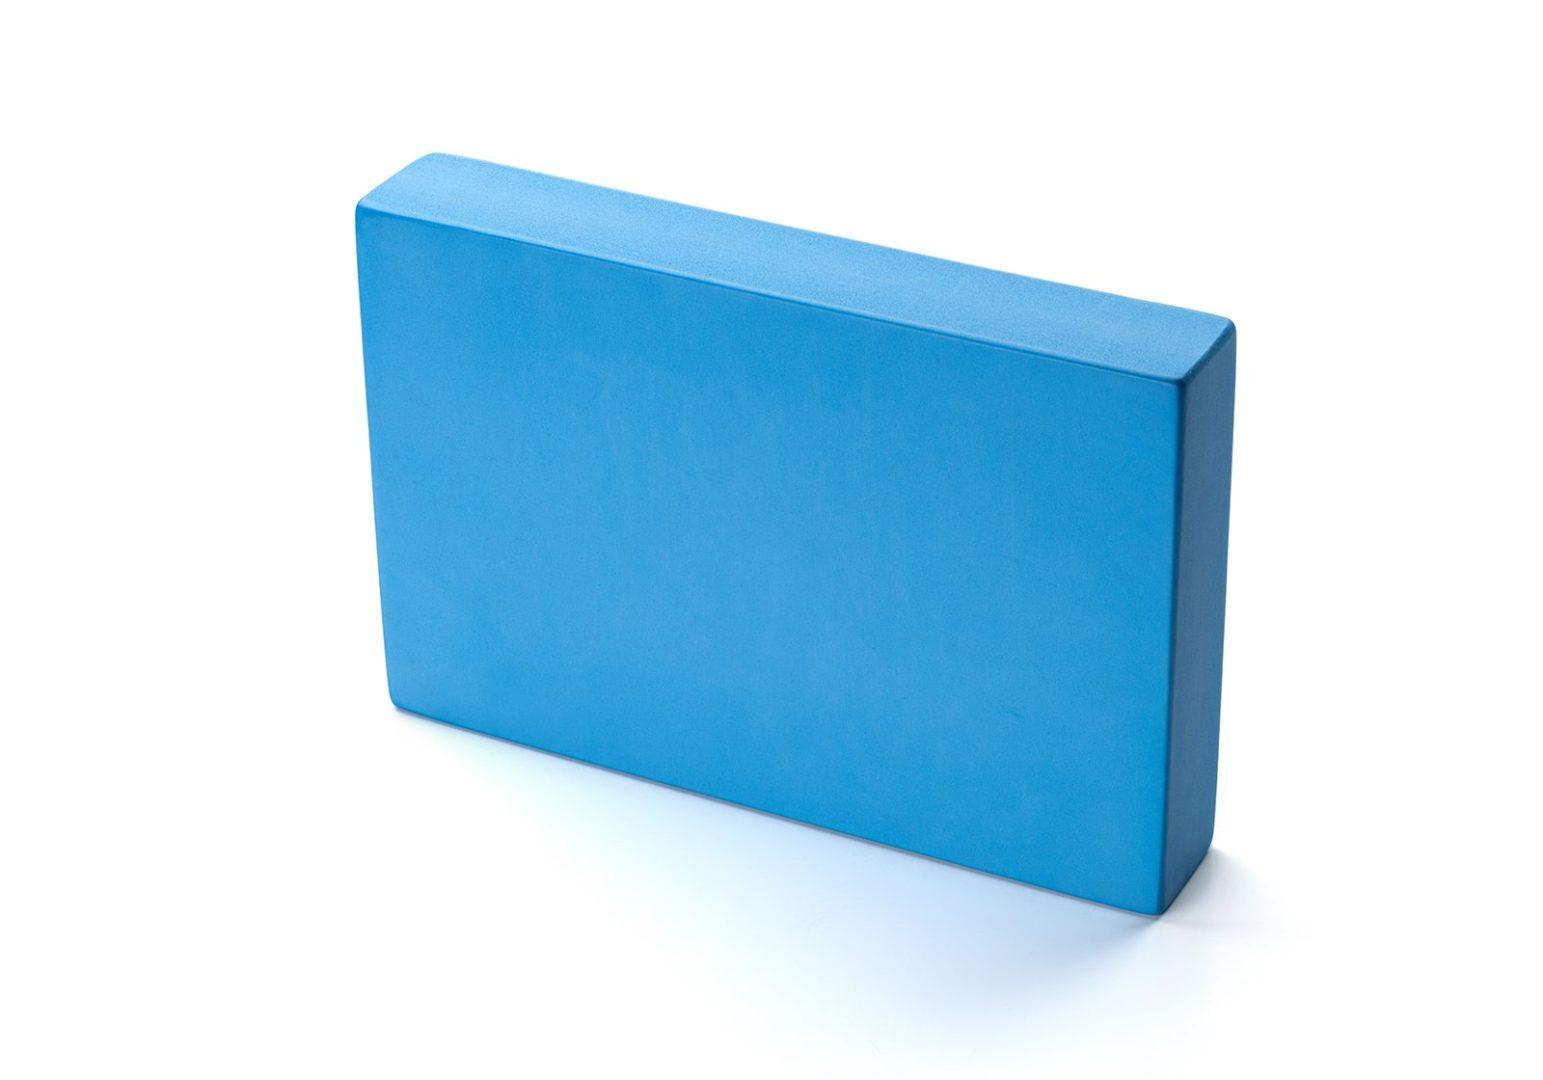 kurma_yoga_foam-block_plank_light-blue_standing.jpg